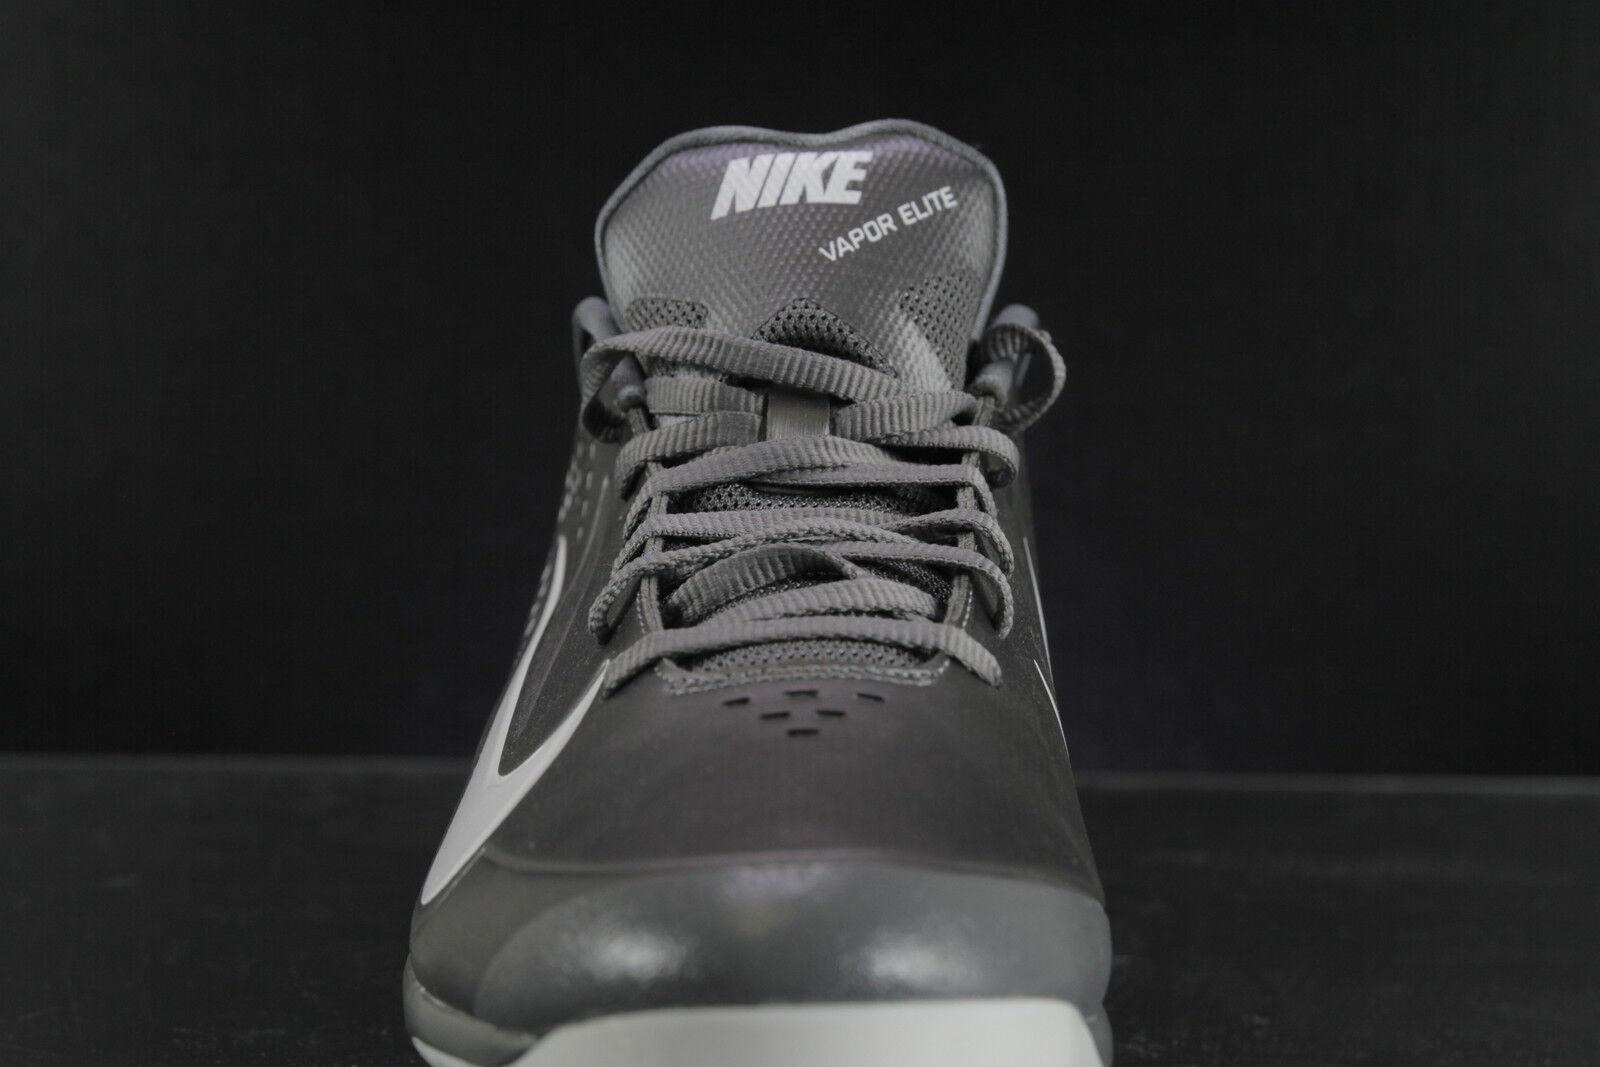 Nike 538553 015 015 015 zoom zur baseball metal-gray/Weiß abn - men 's Größe 13 374d06